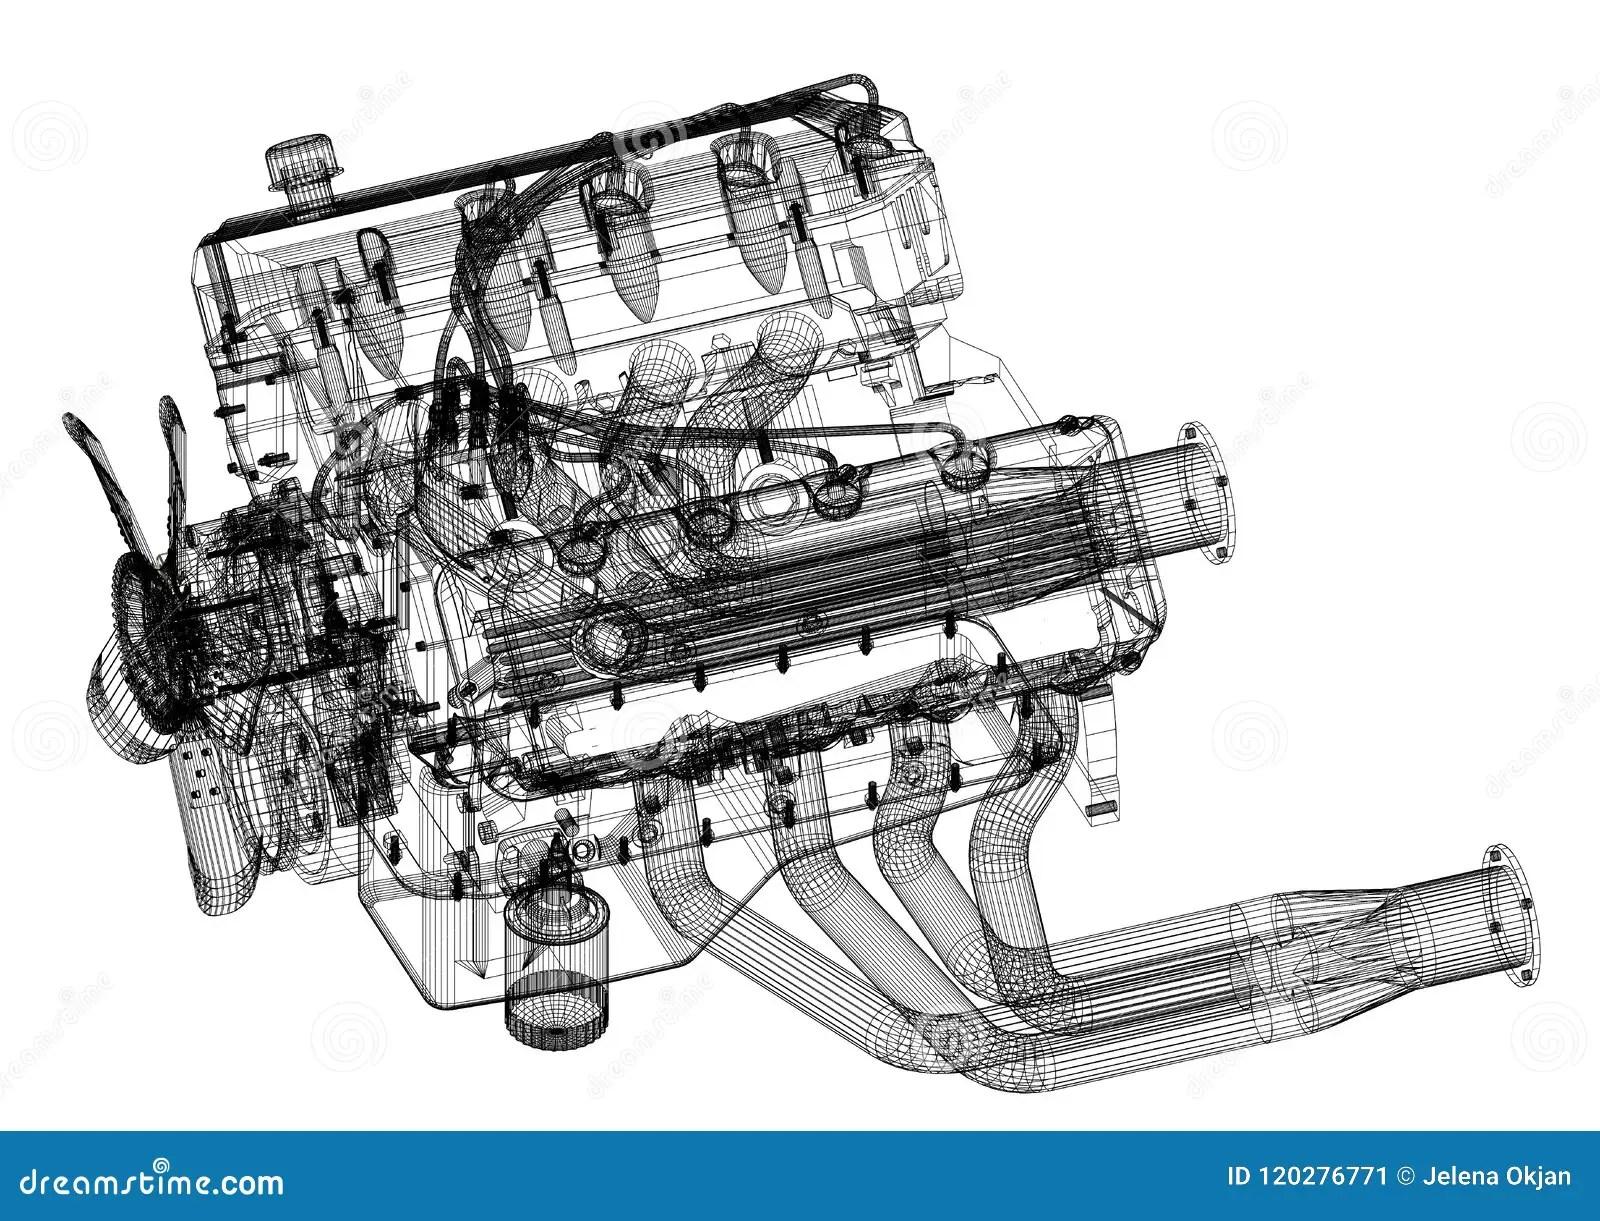 Blueprinting A Motor